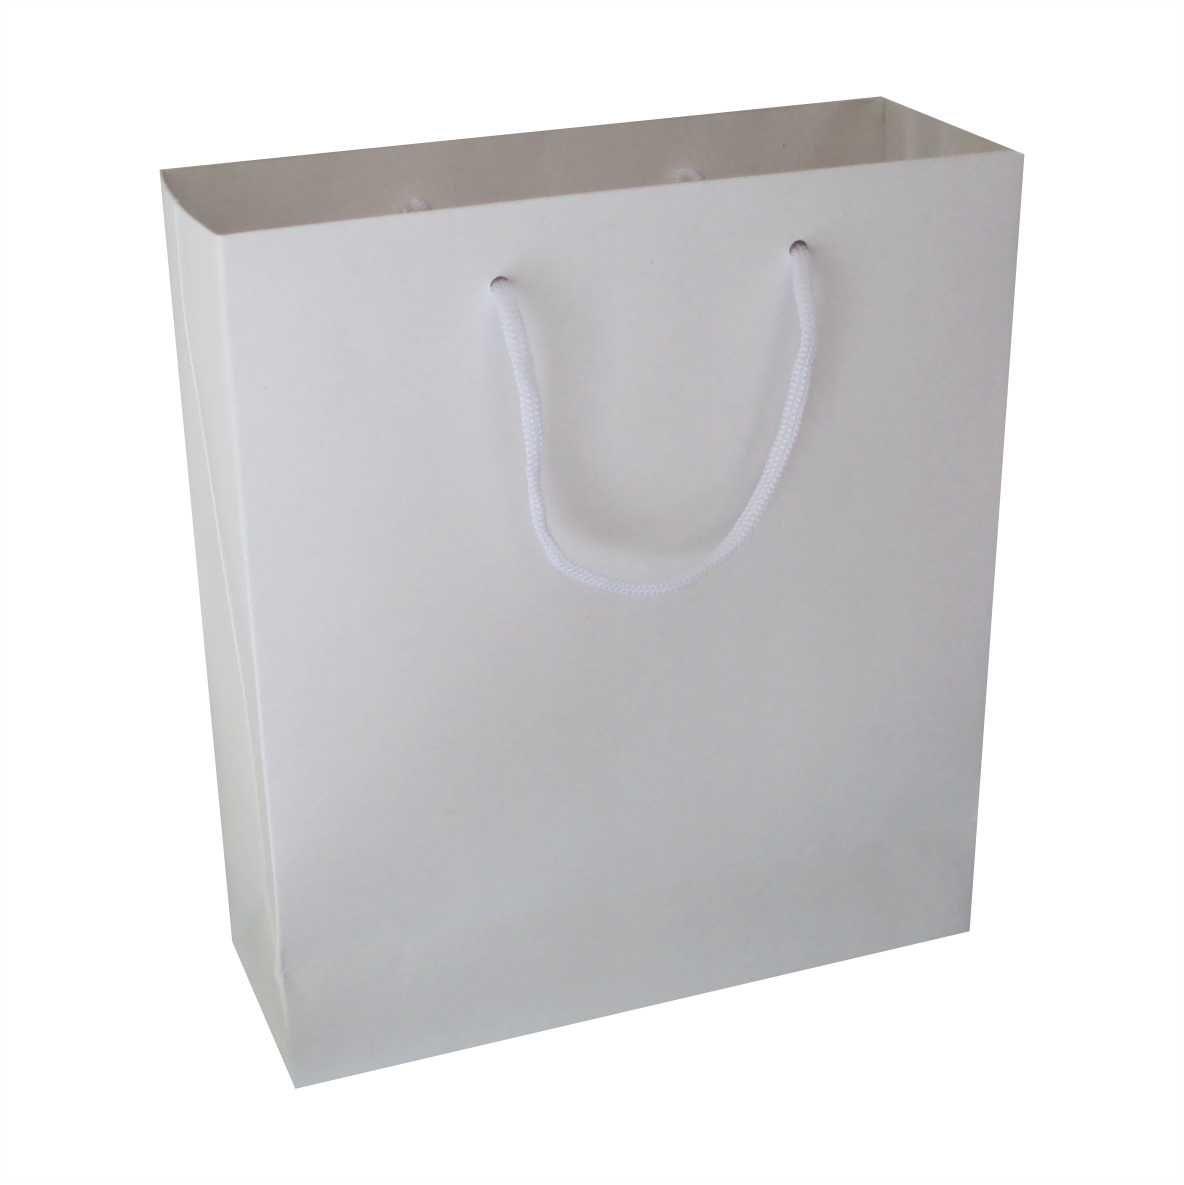 Sacola branca media (22x24x8 cm) - 10 unidades